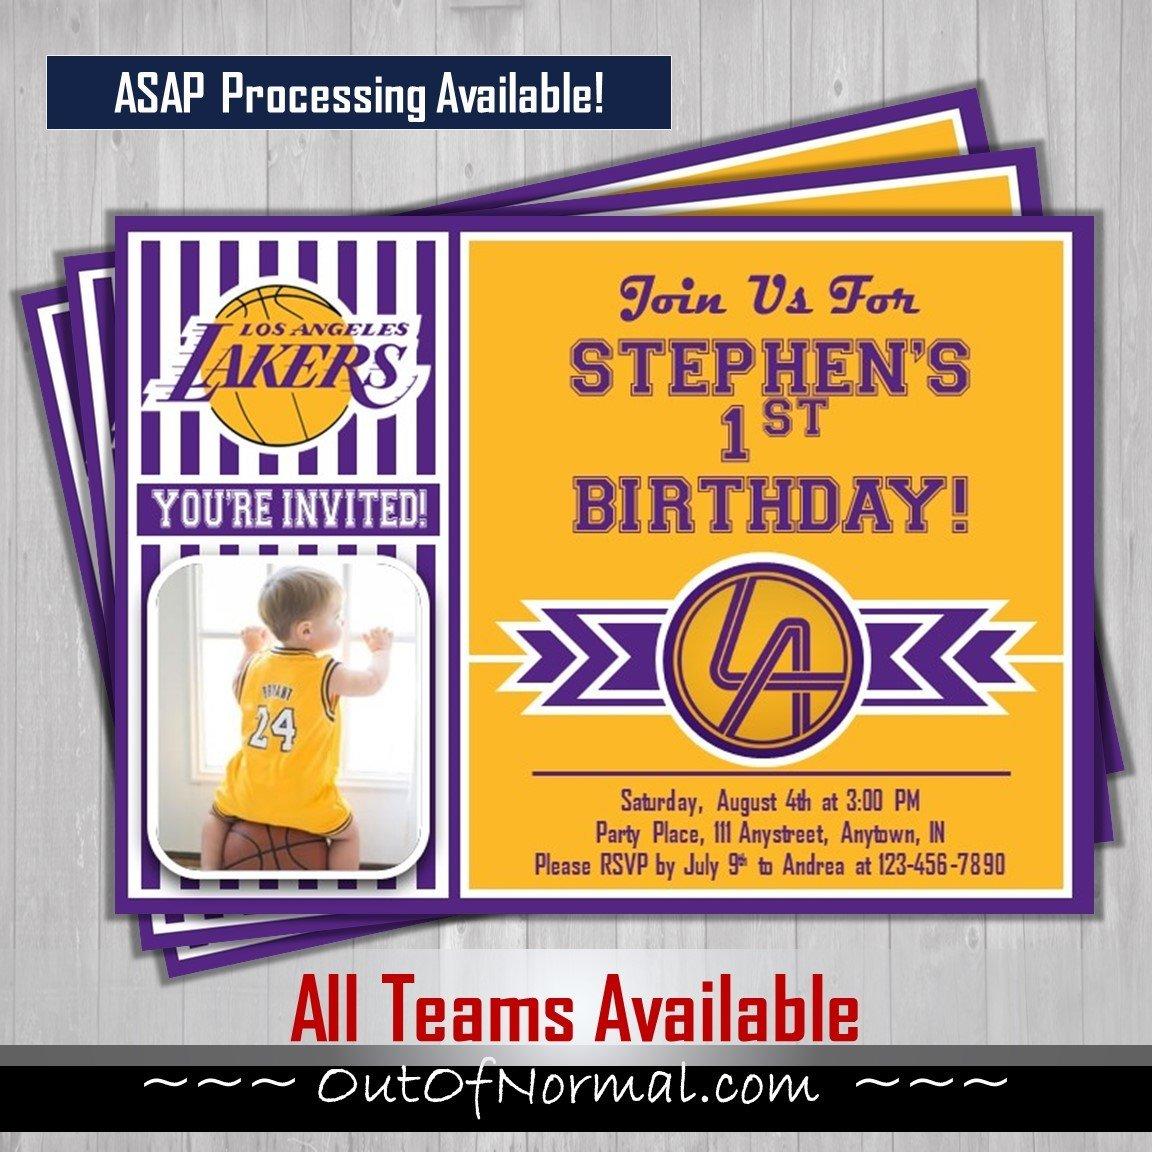 Los Angeles Lakers NBA Basketball Photo Invitation